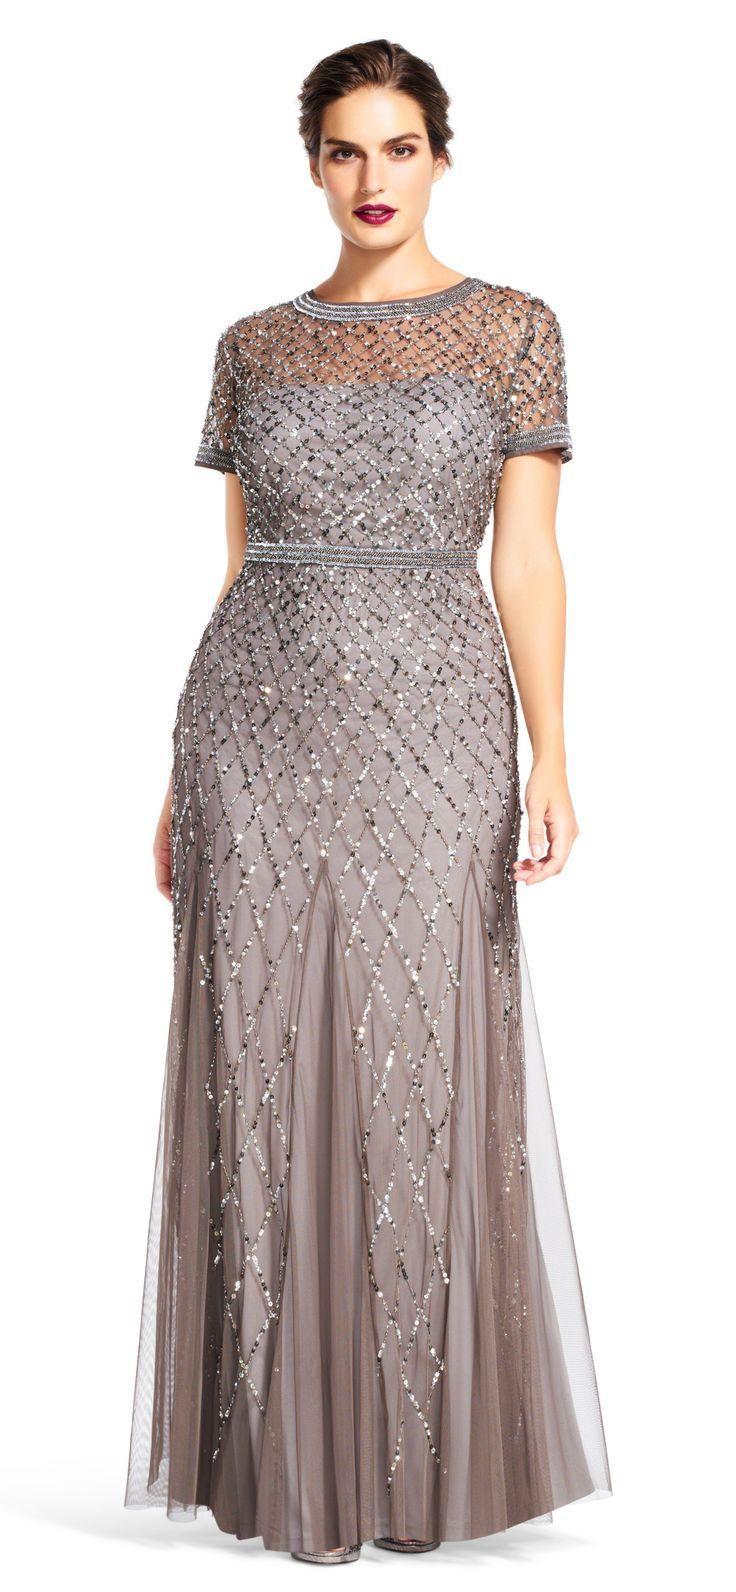 24 Plus Size Long Wedding Guest Dresses {with Sleeves} - Plus Size Gowns with Sleeves - Plus Size Fashion for Women - alexawebb.com #alexawebb